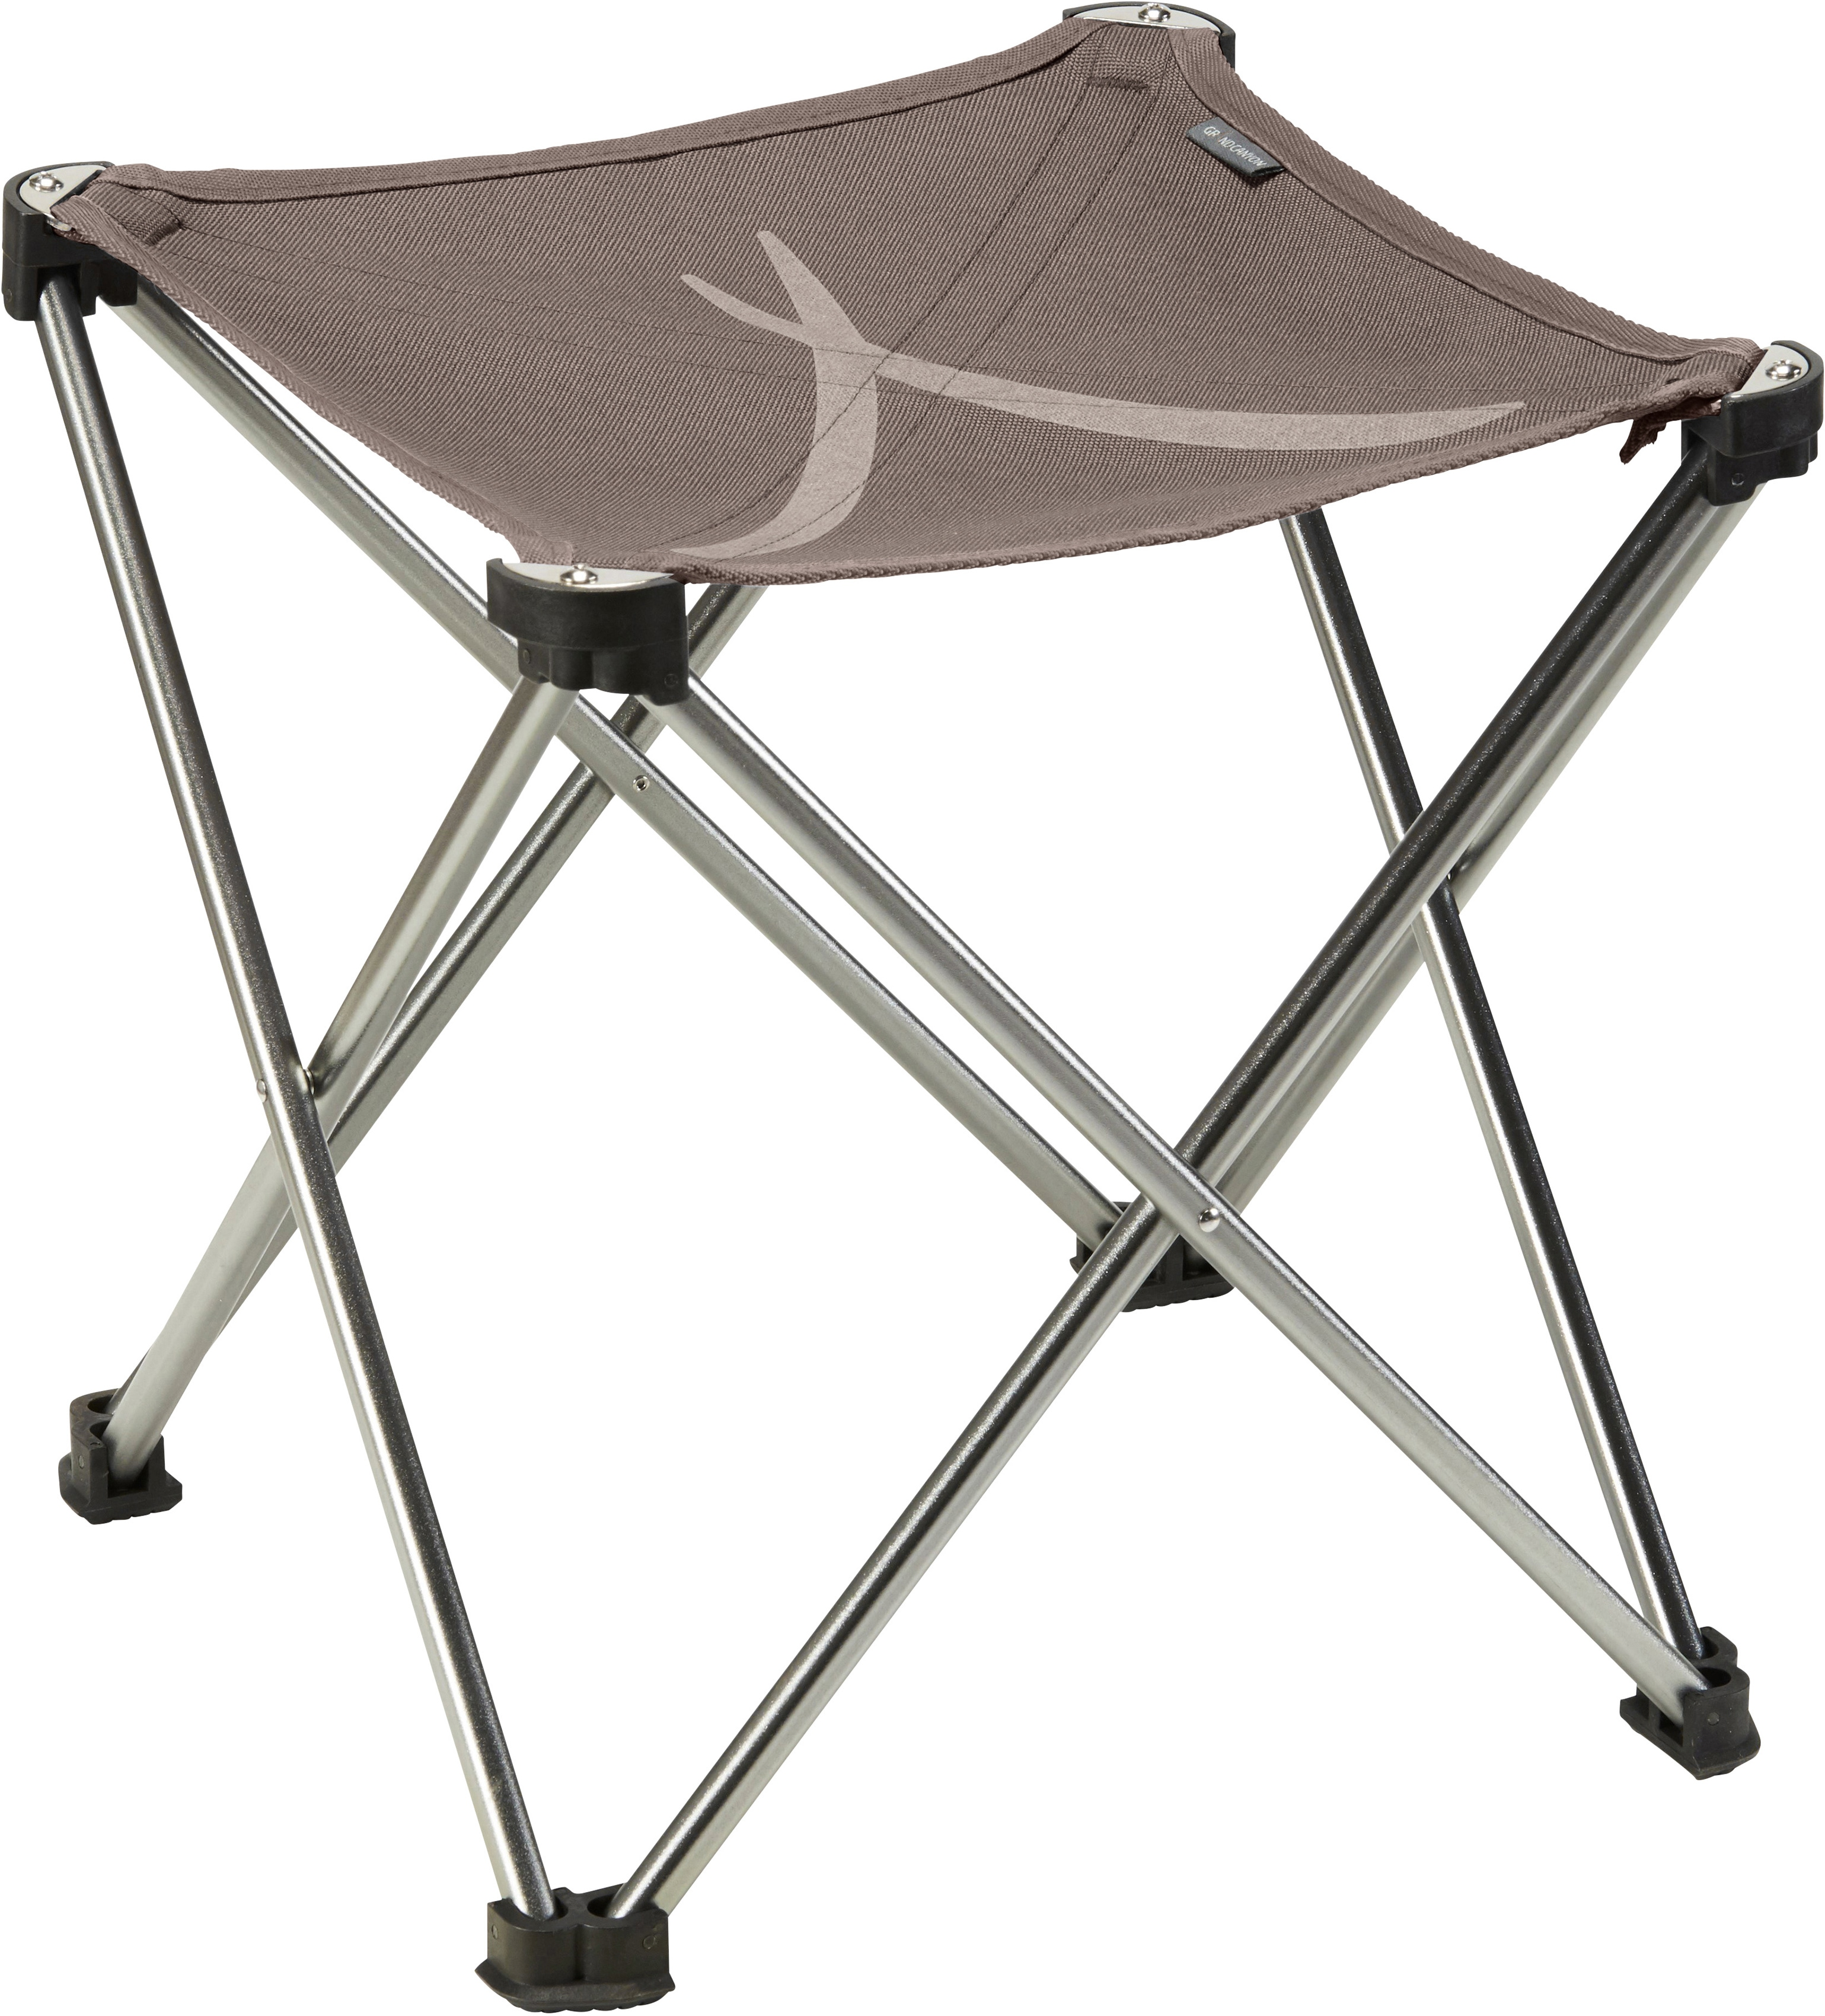 GRAND CANYON Campingstuhl SINYALA MINI grau Campingmöbel Camping Schlafen Outdoor